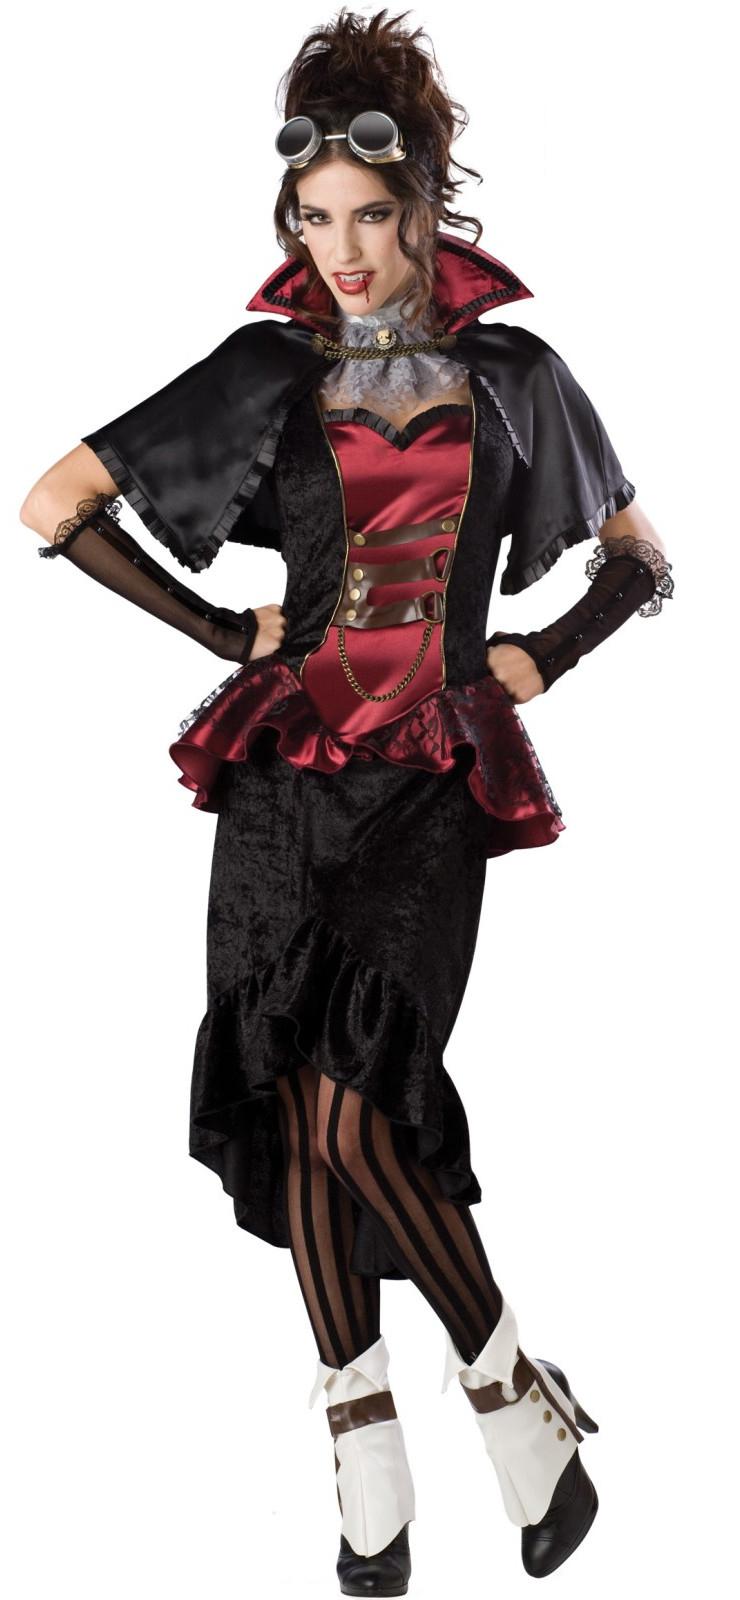 elite quality steampunk vampiress costume n6722. Black Bedroom Furniture Sets. Home Design Ideas